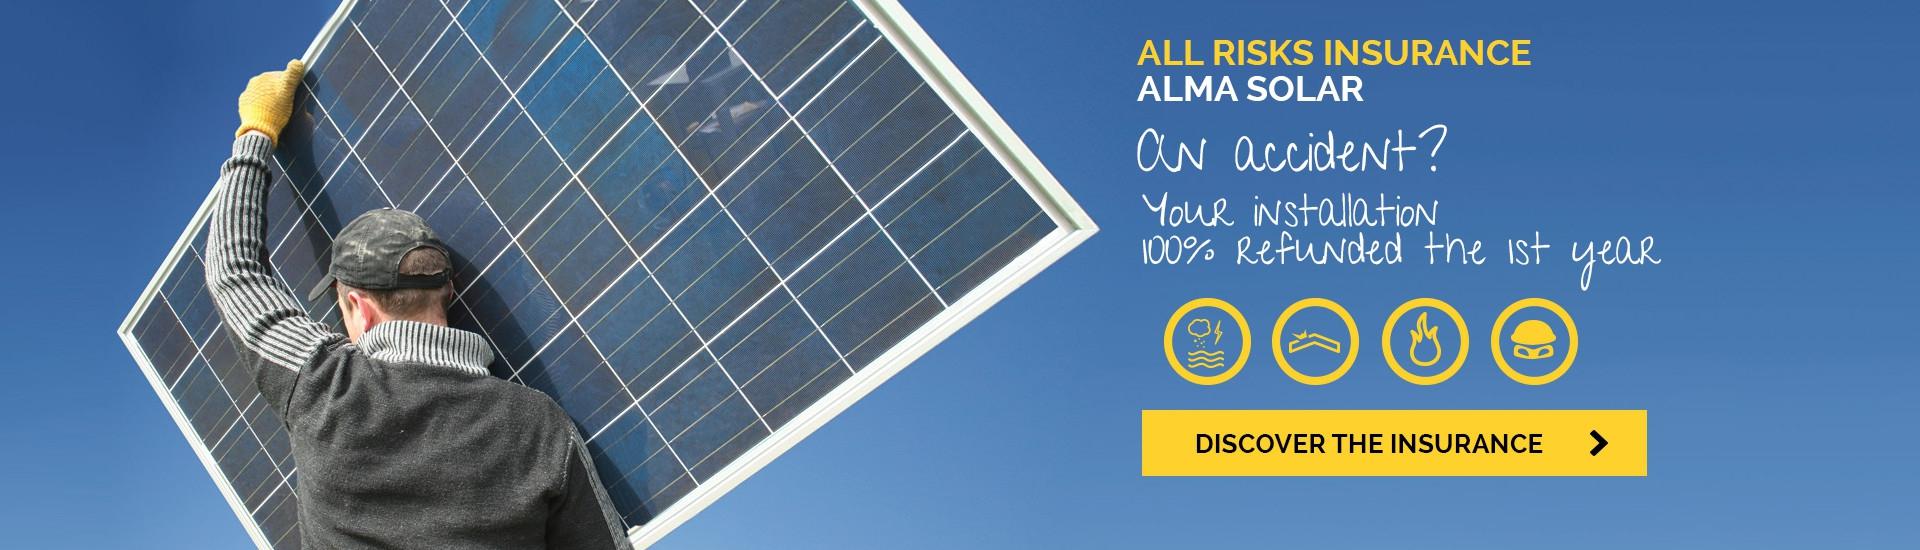 all-risk-insurance-alma-solar